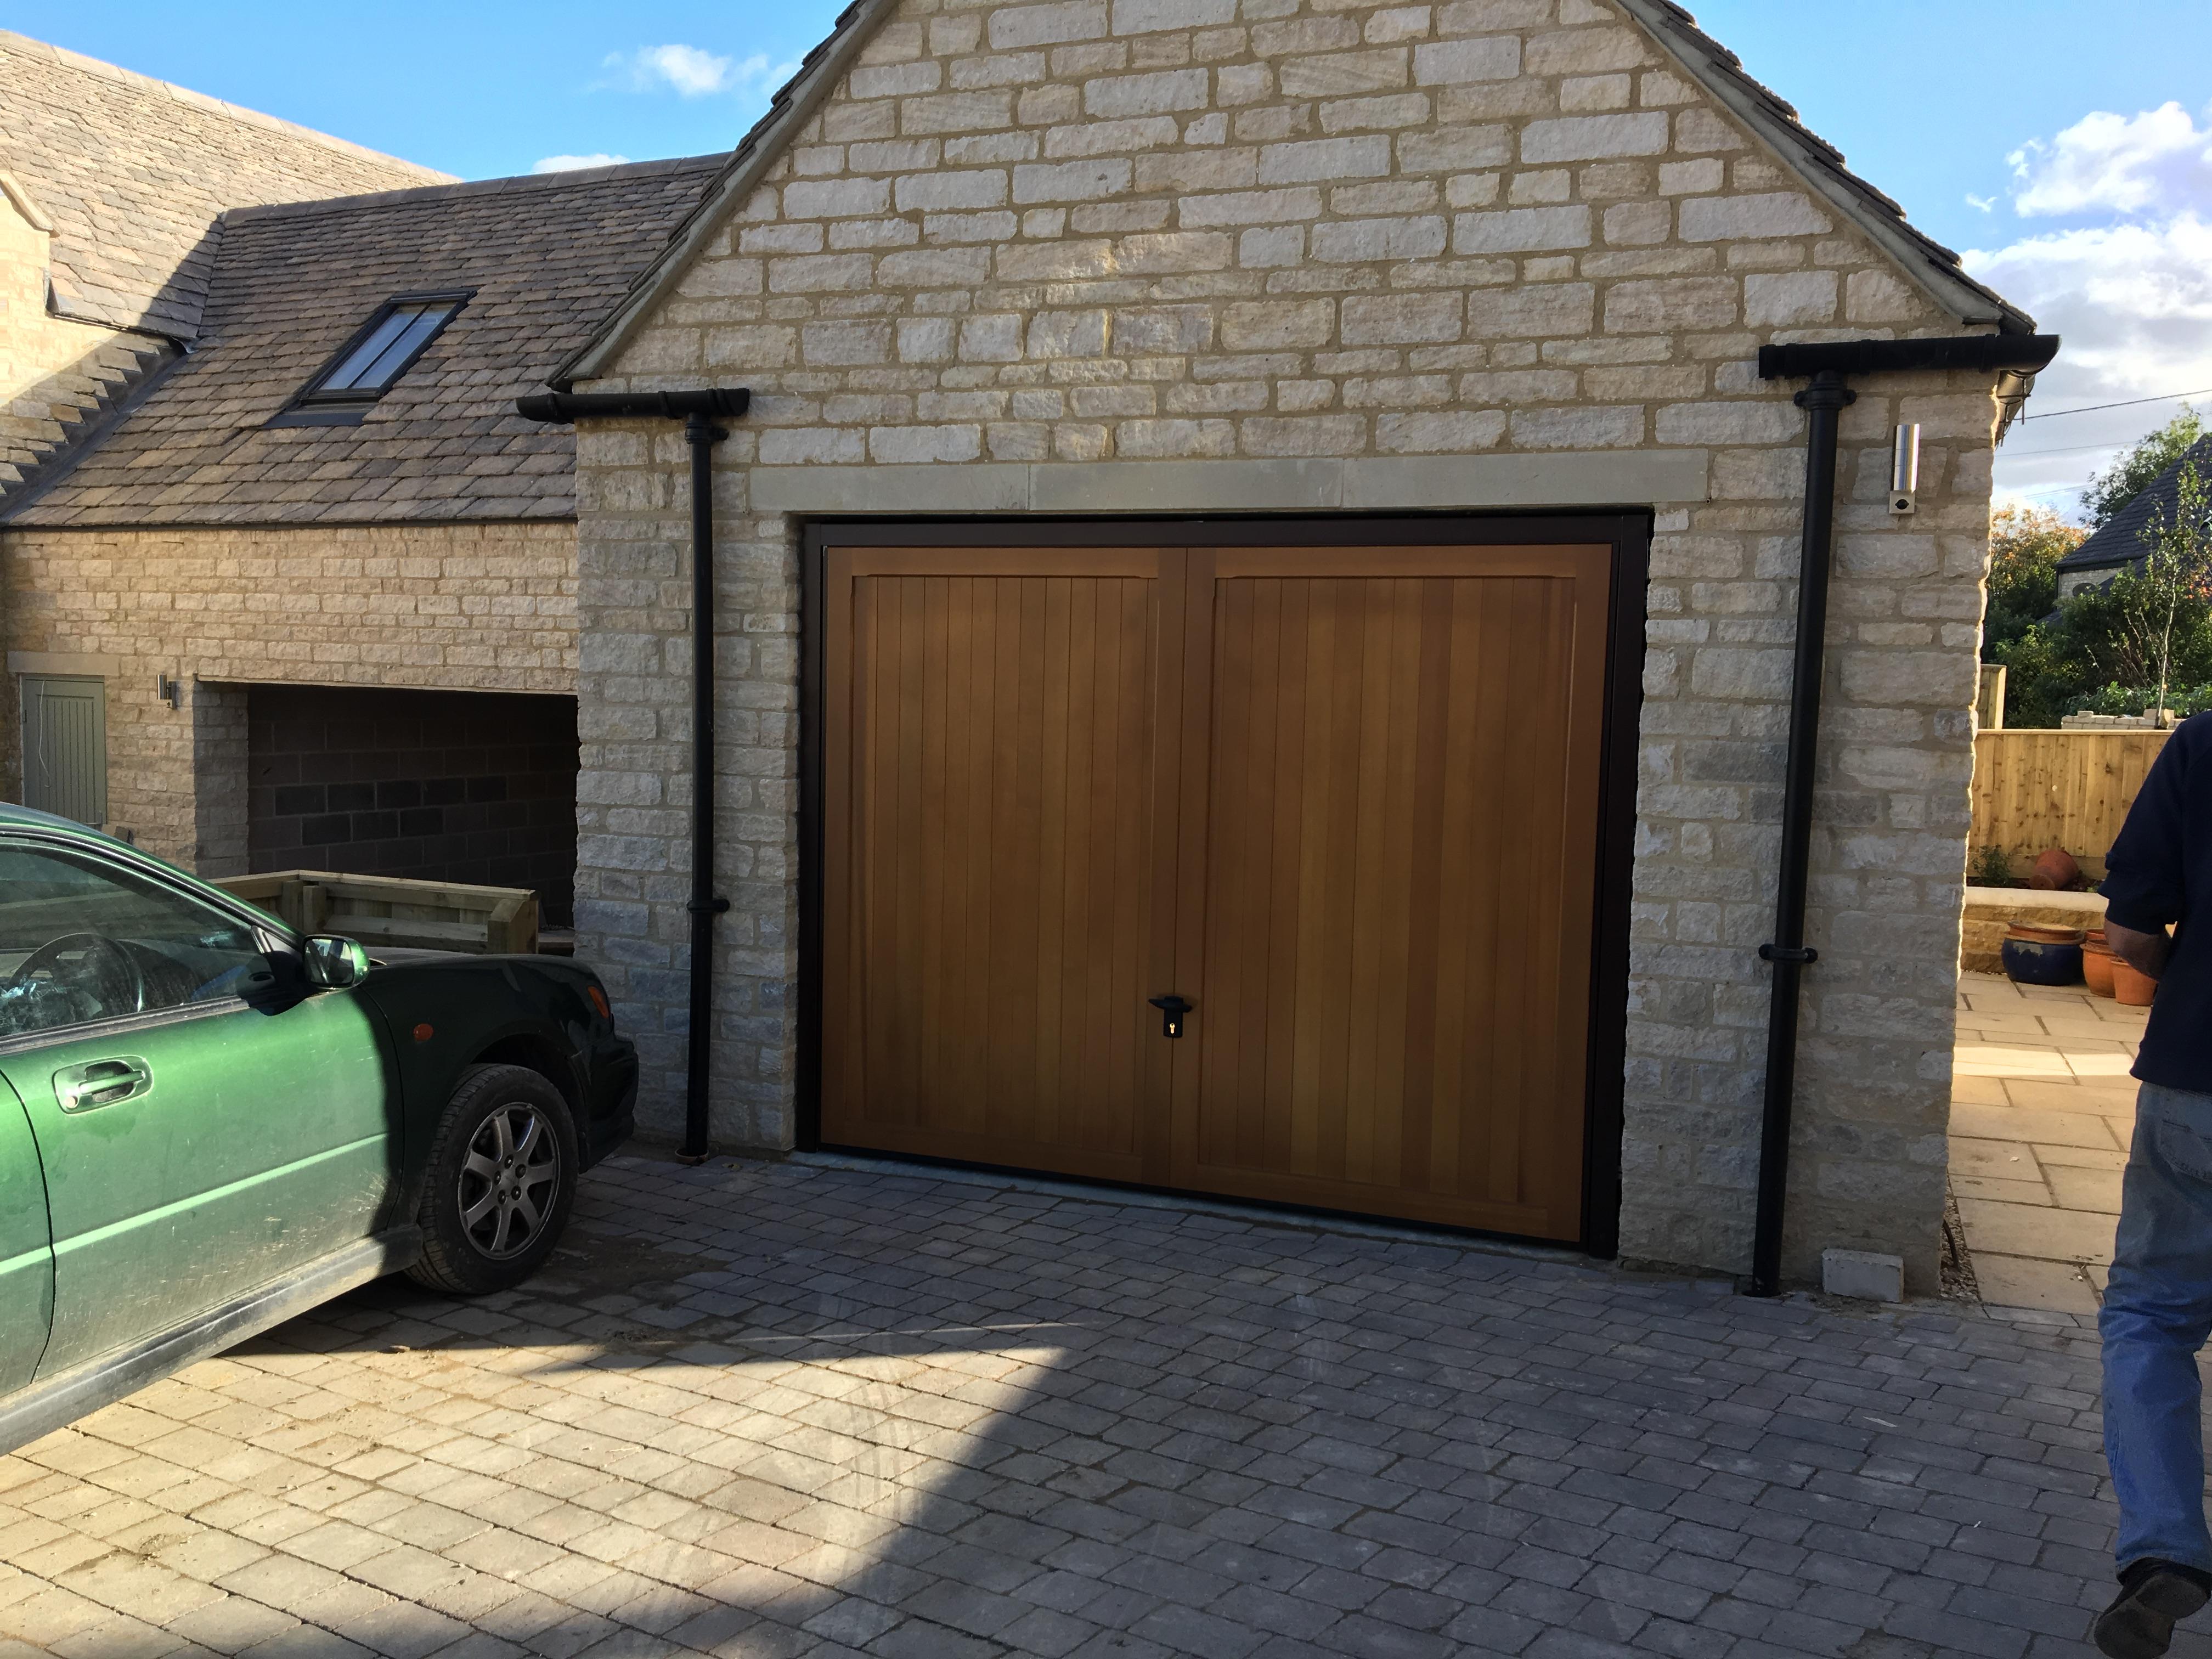 Garage door archives elite gd cardale timber retractable garage doors berkeley vertical design fully finished in light oak installed in shipton under wychwood rubansaba